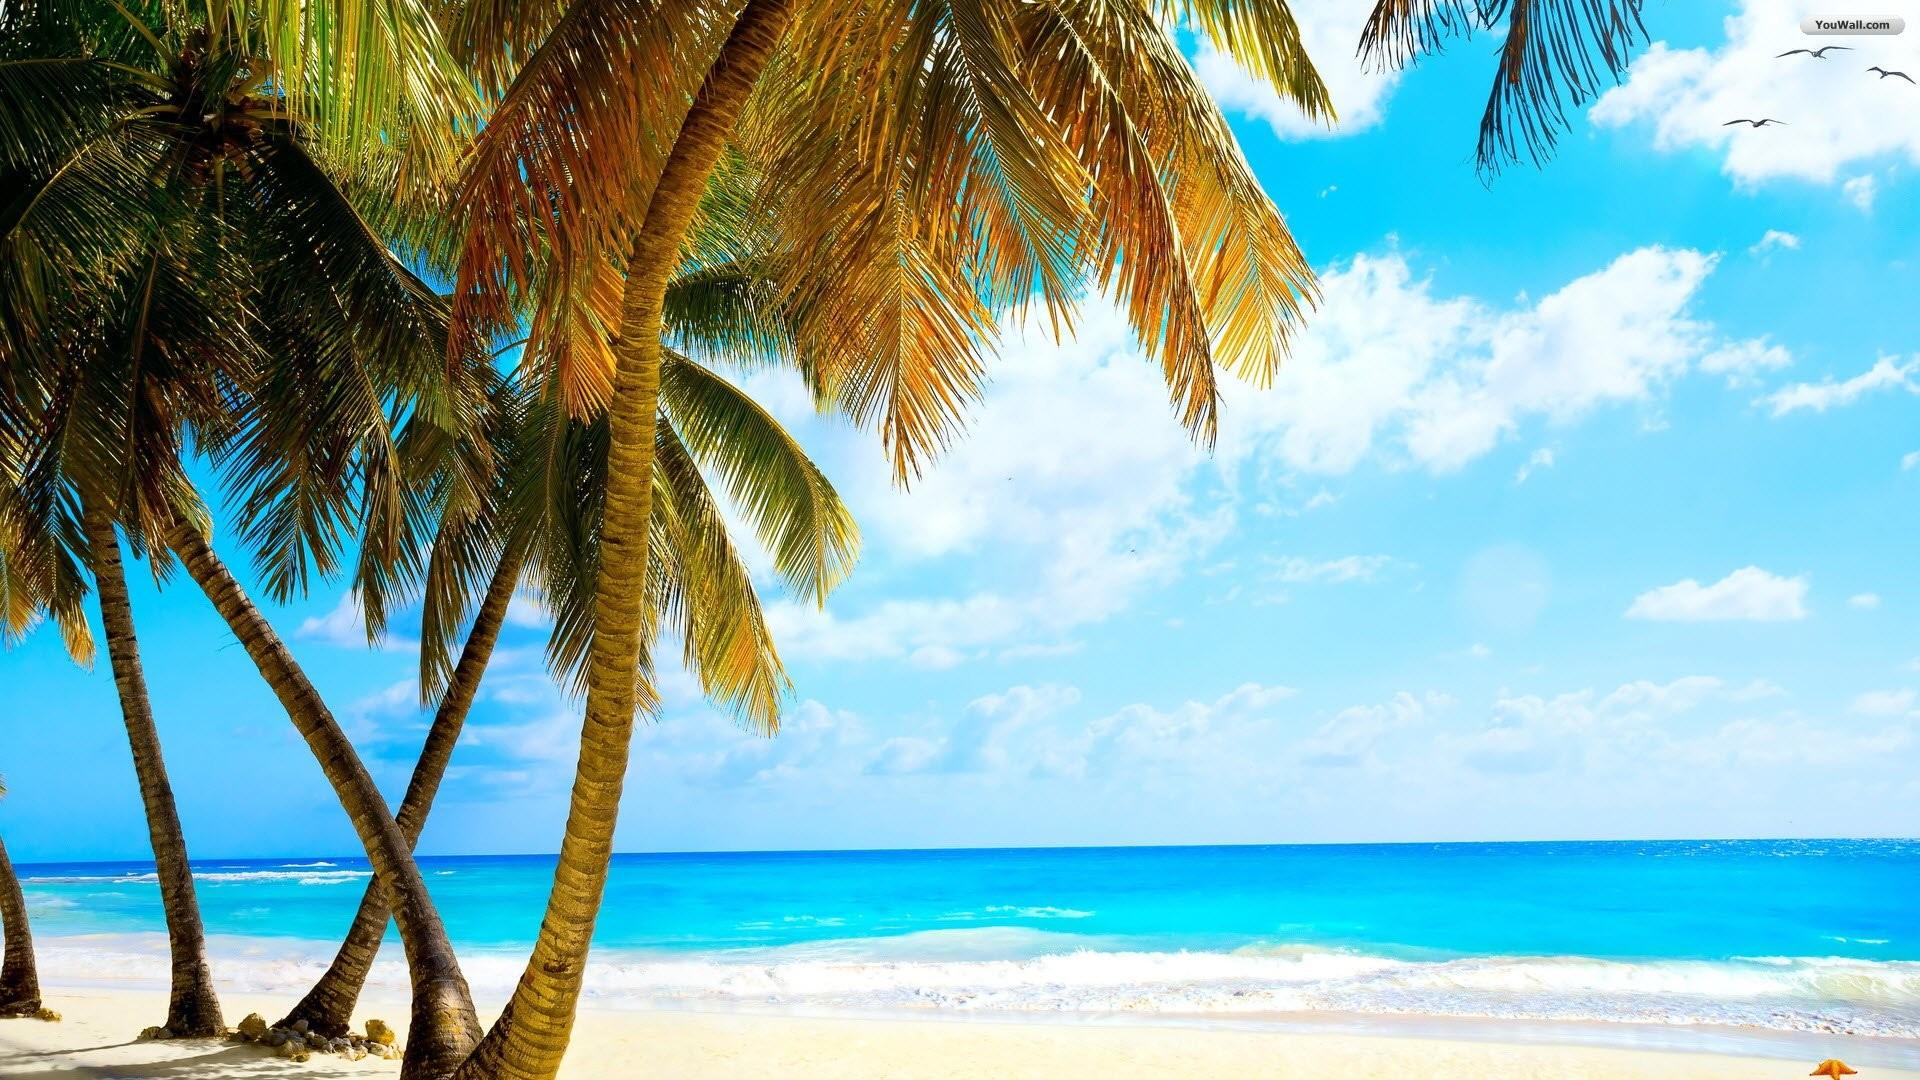 YouWall – Wonderful Tropical Beach Wallpaper – Wallpaper .